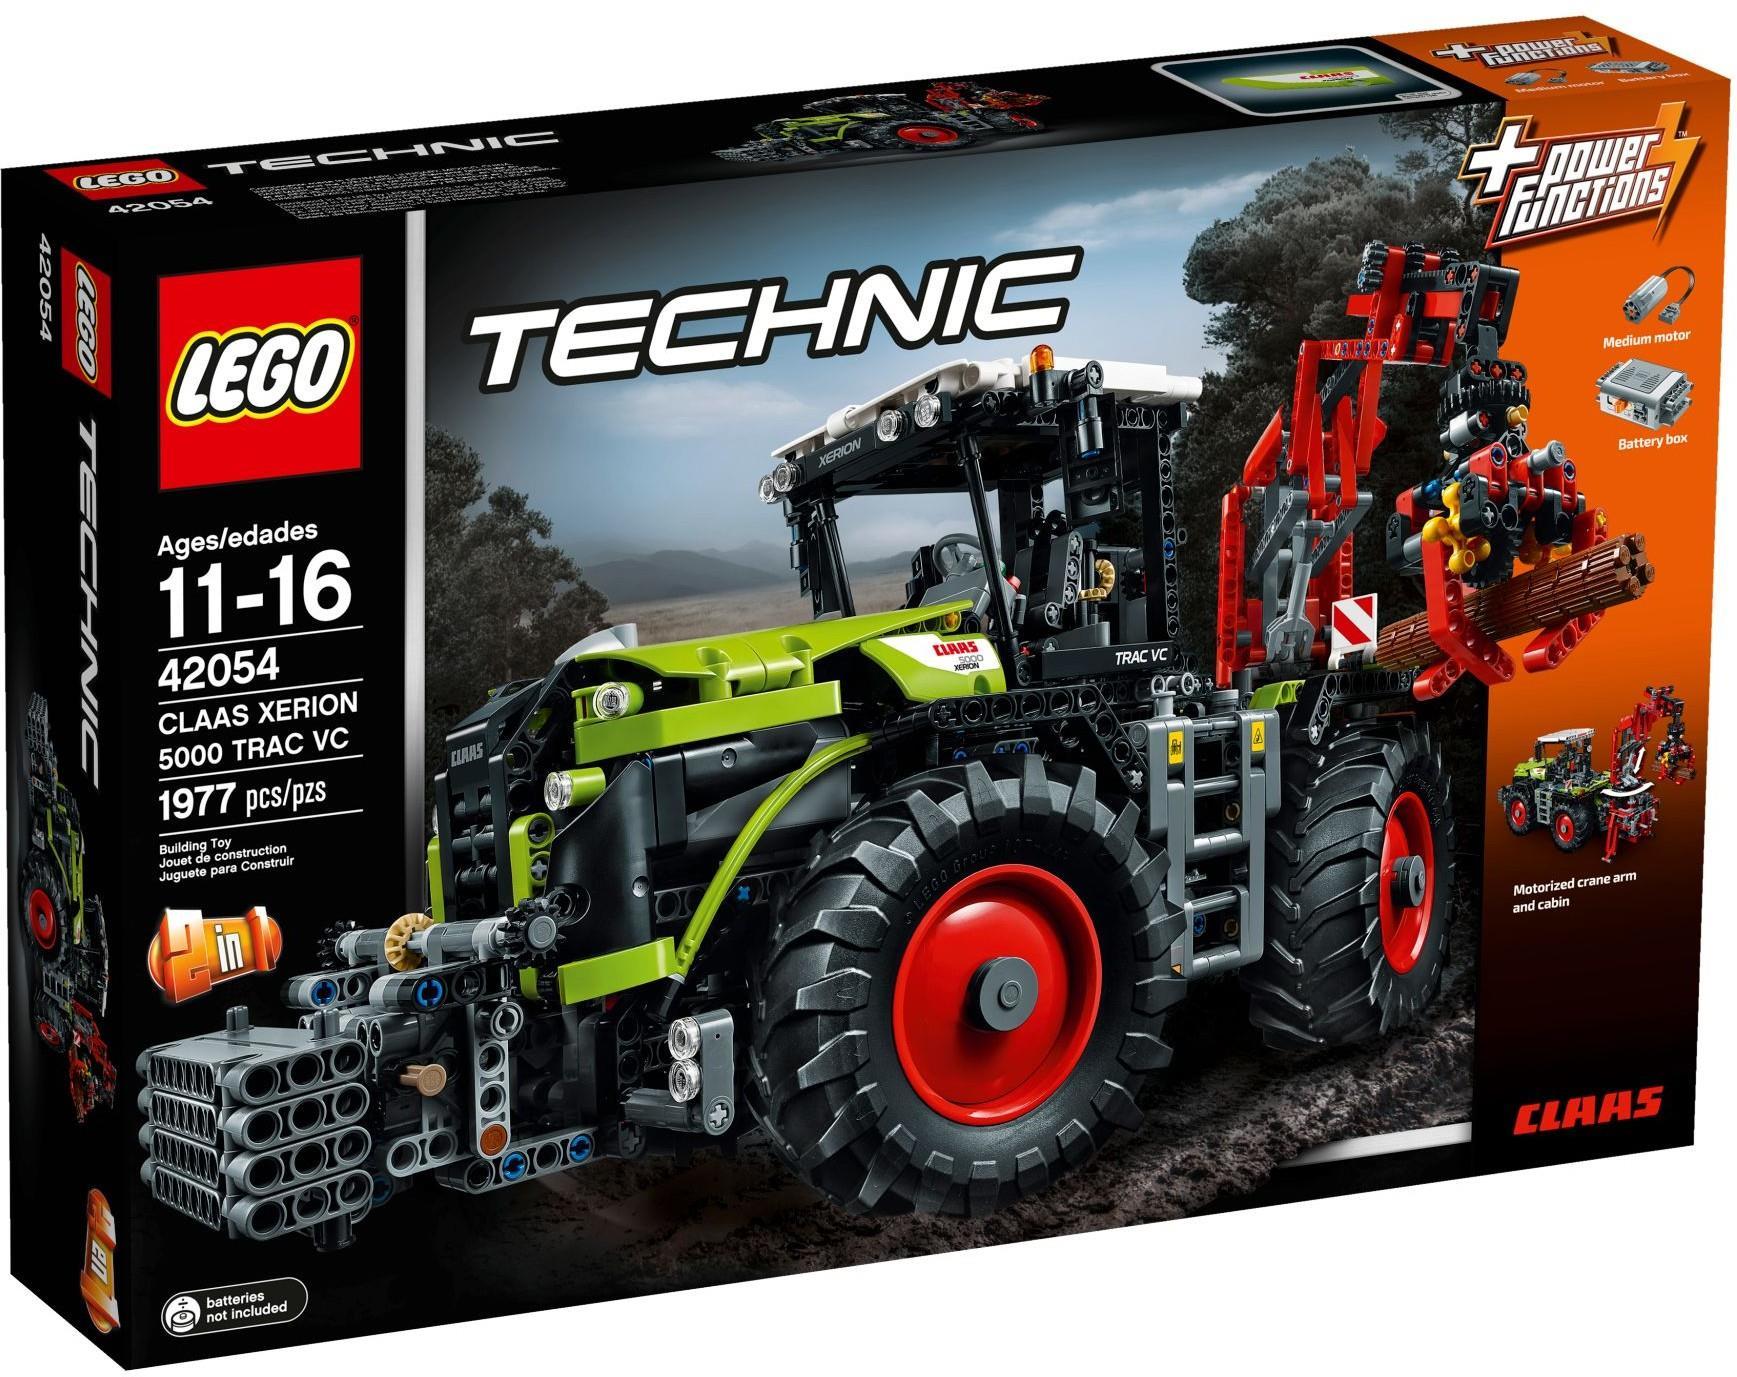 LEGO Technic Klocki CLAAS XERION 5000 42054